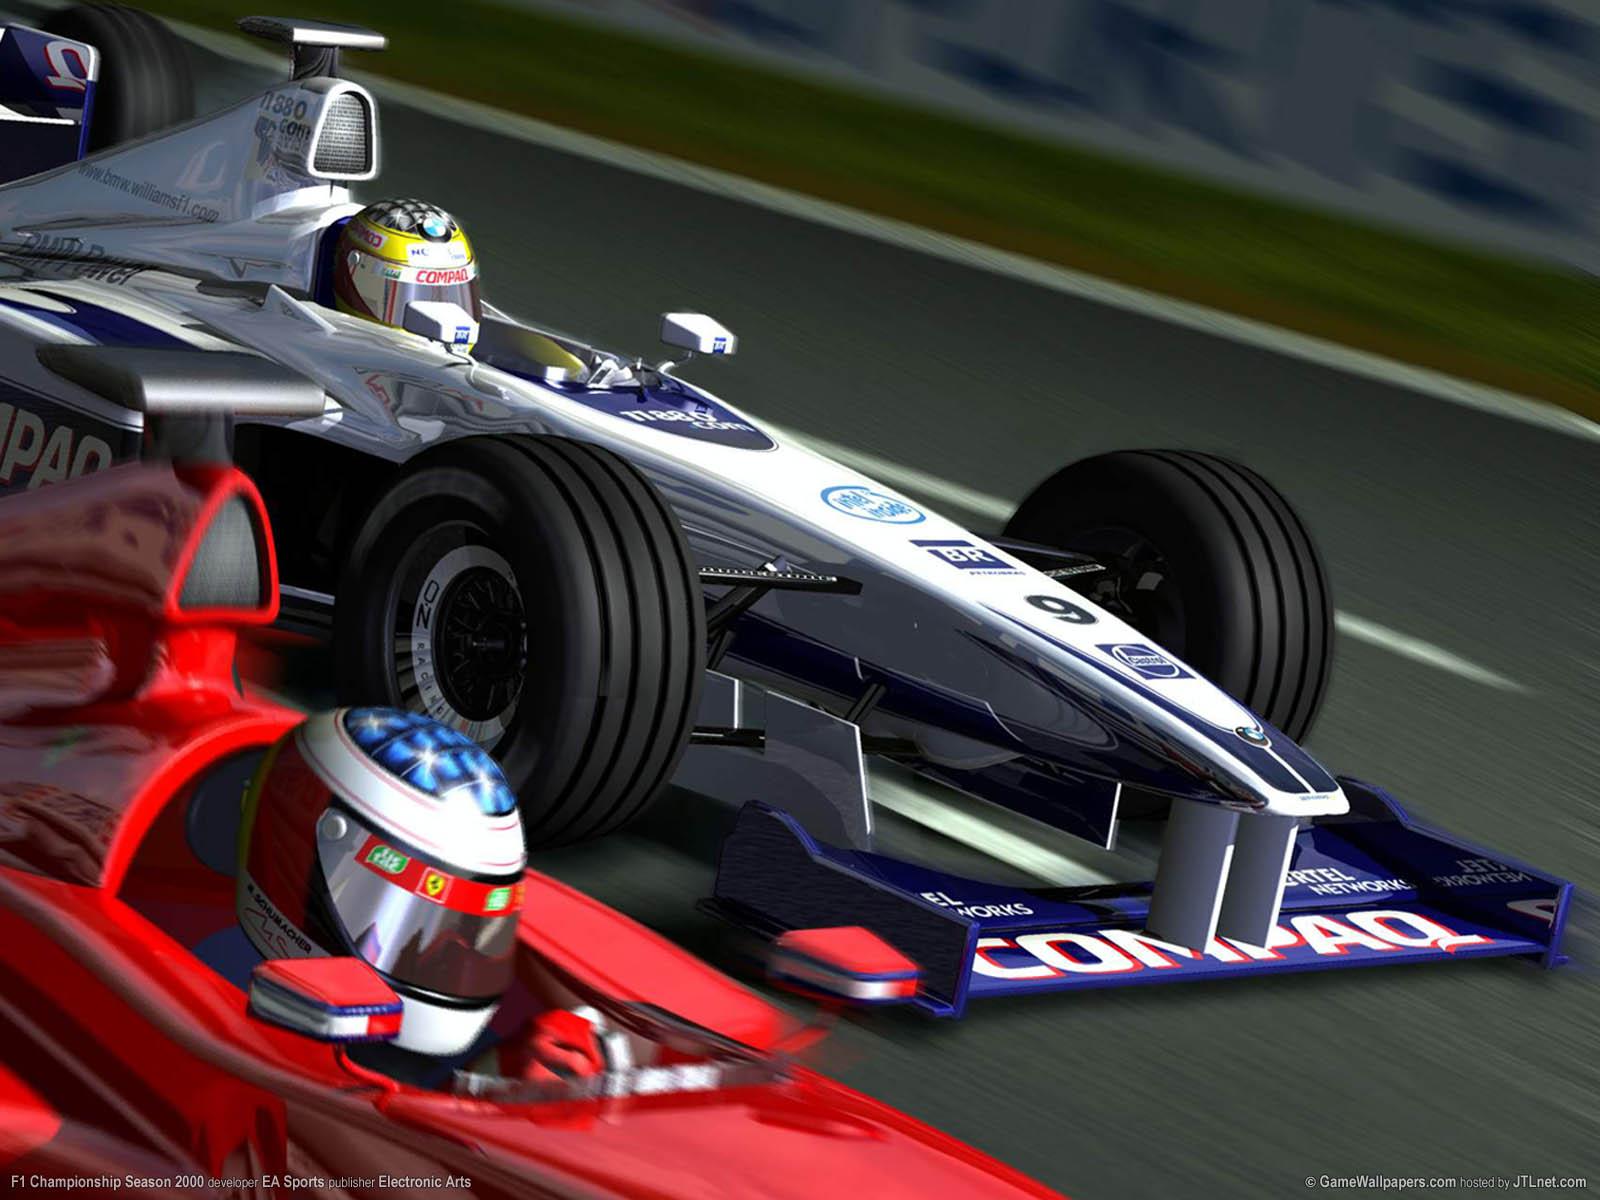 F1 Championship Season 2000 fond d'écran 01 1600x1200